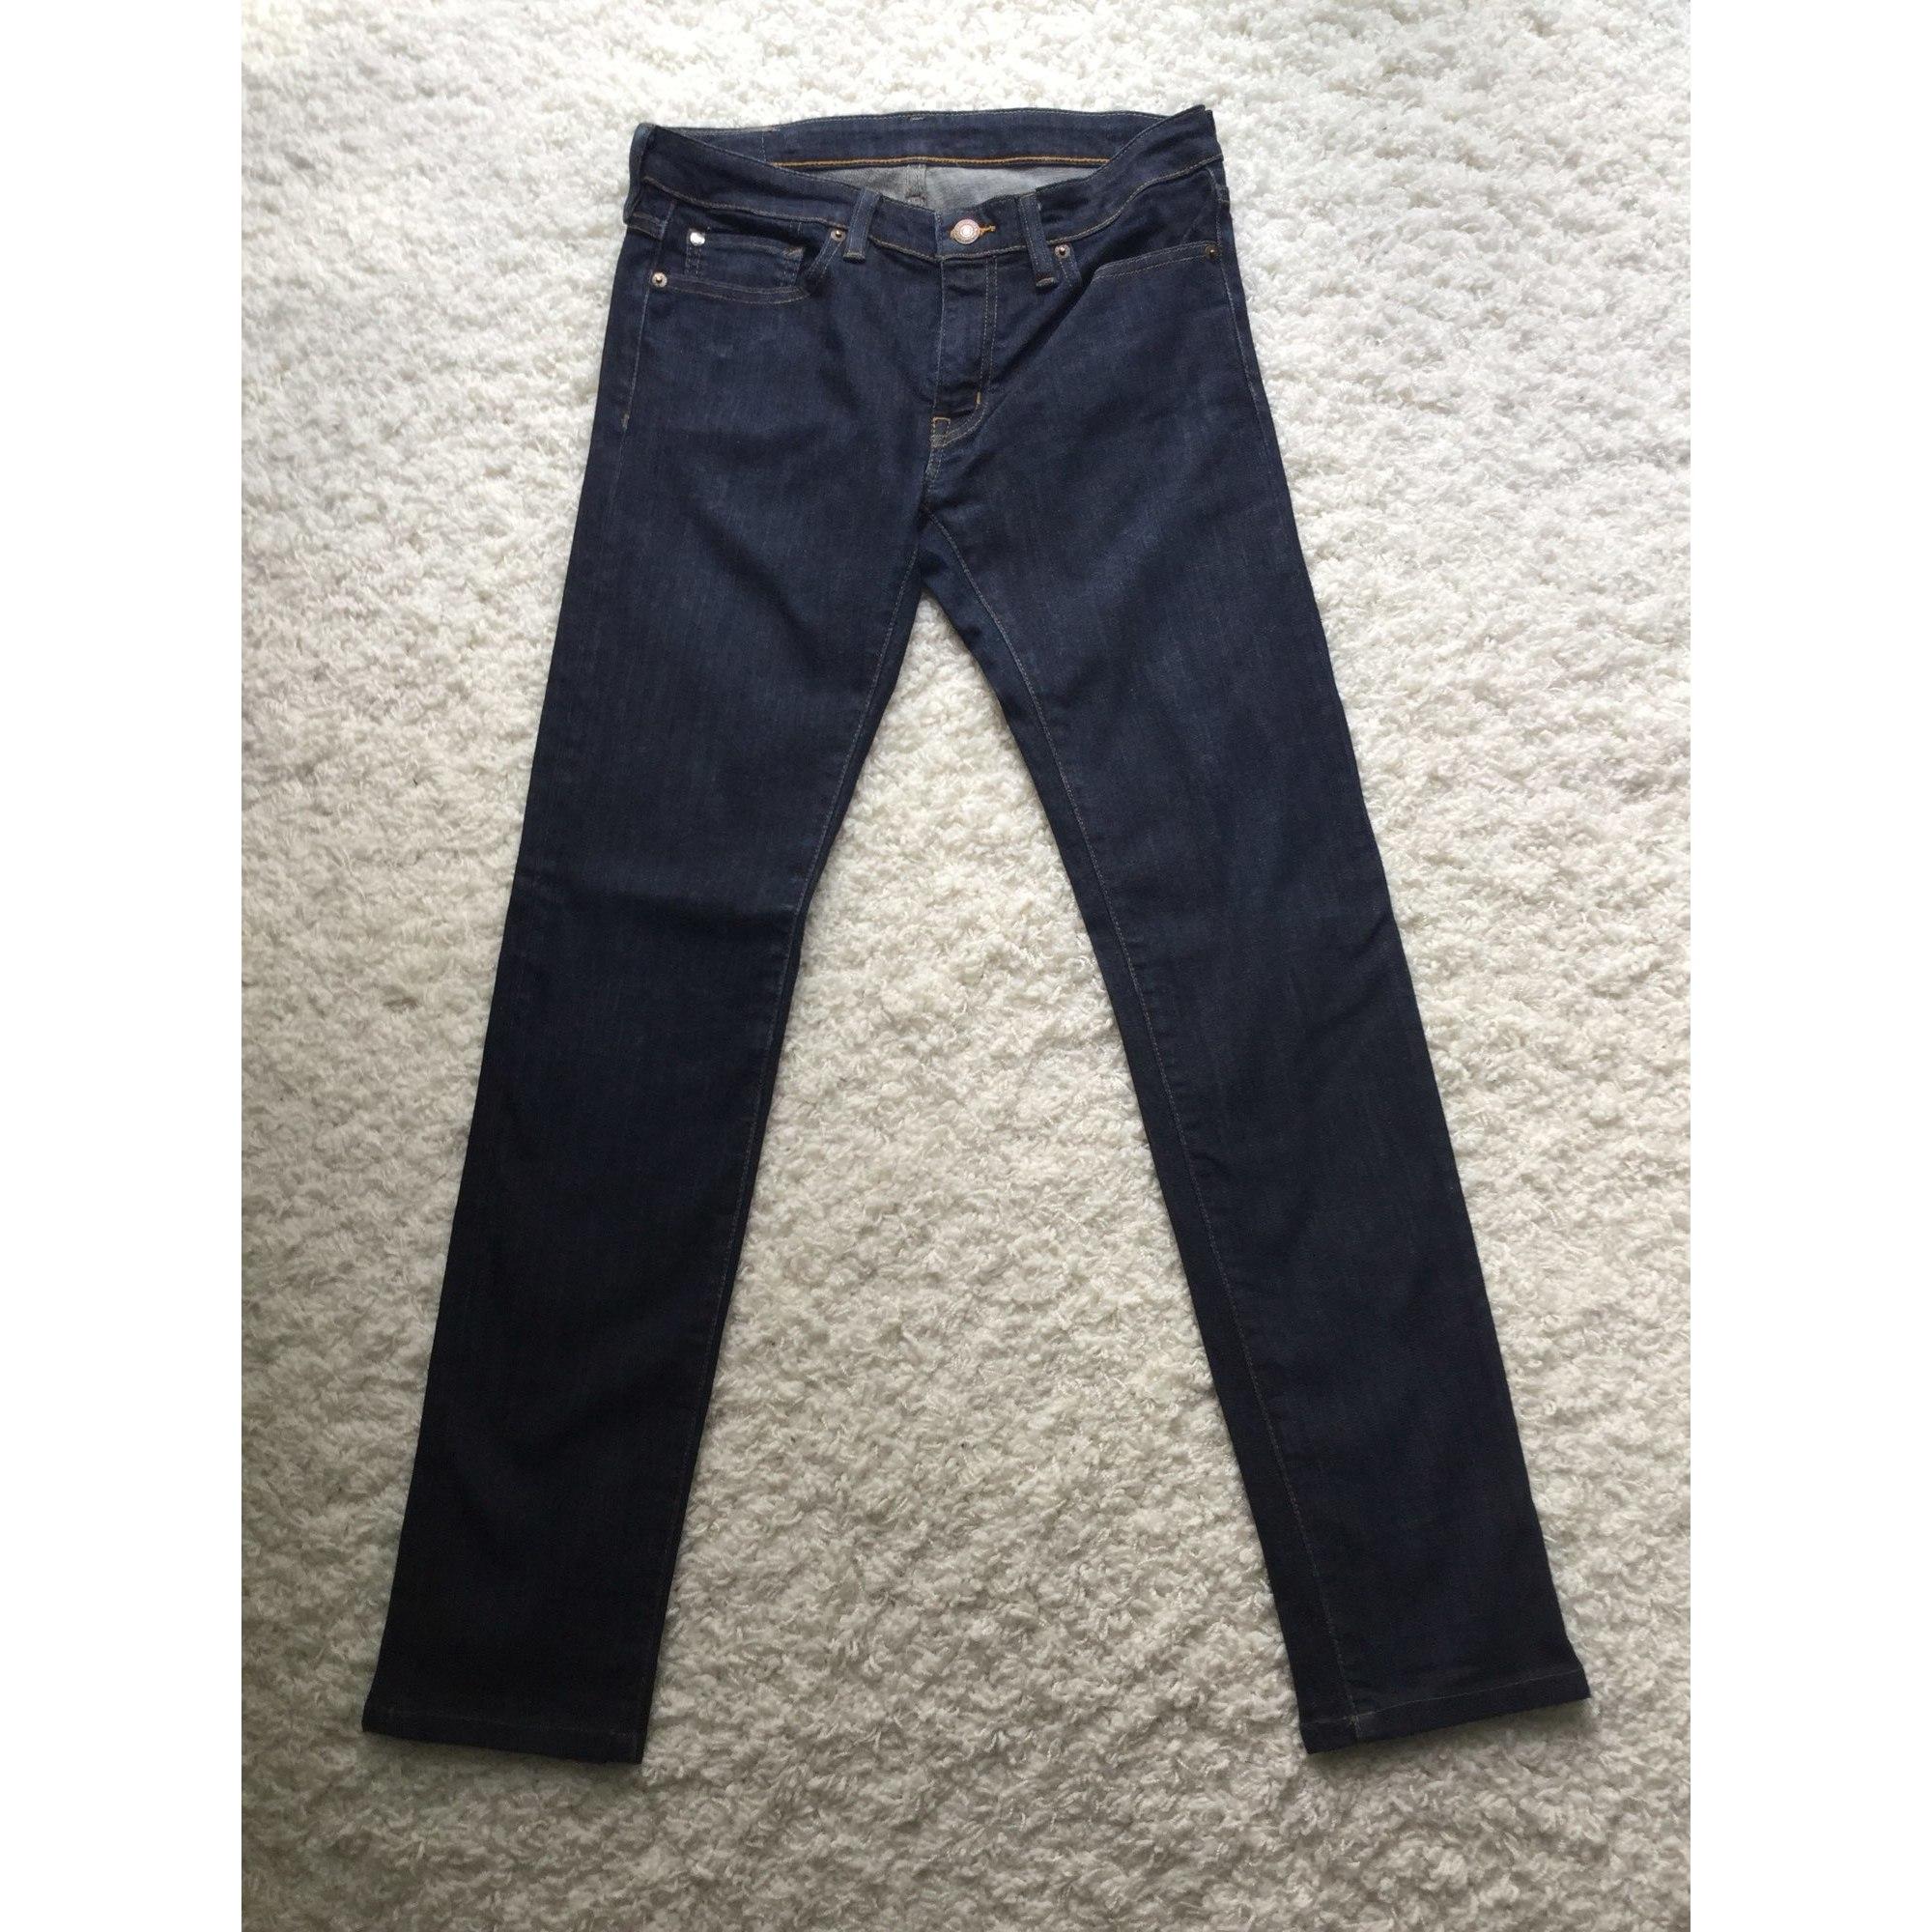 Jeans slim DENIM & SUPPLY Bleu, bleu marine, bleu turquoise